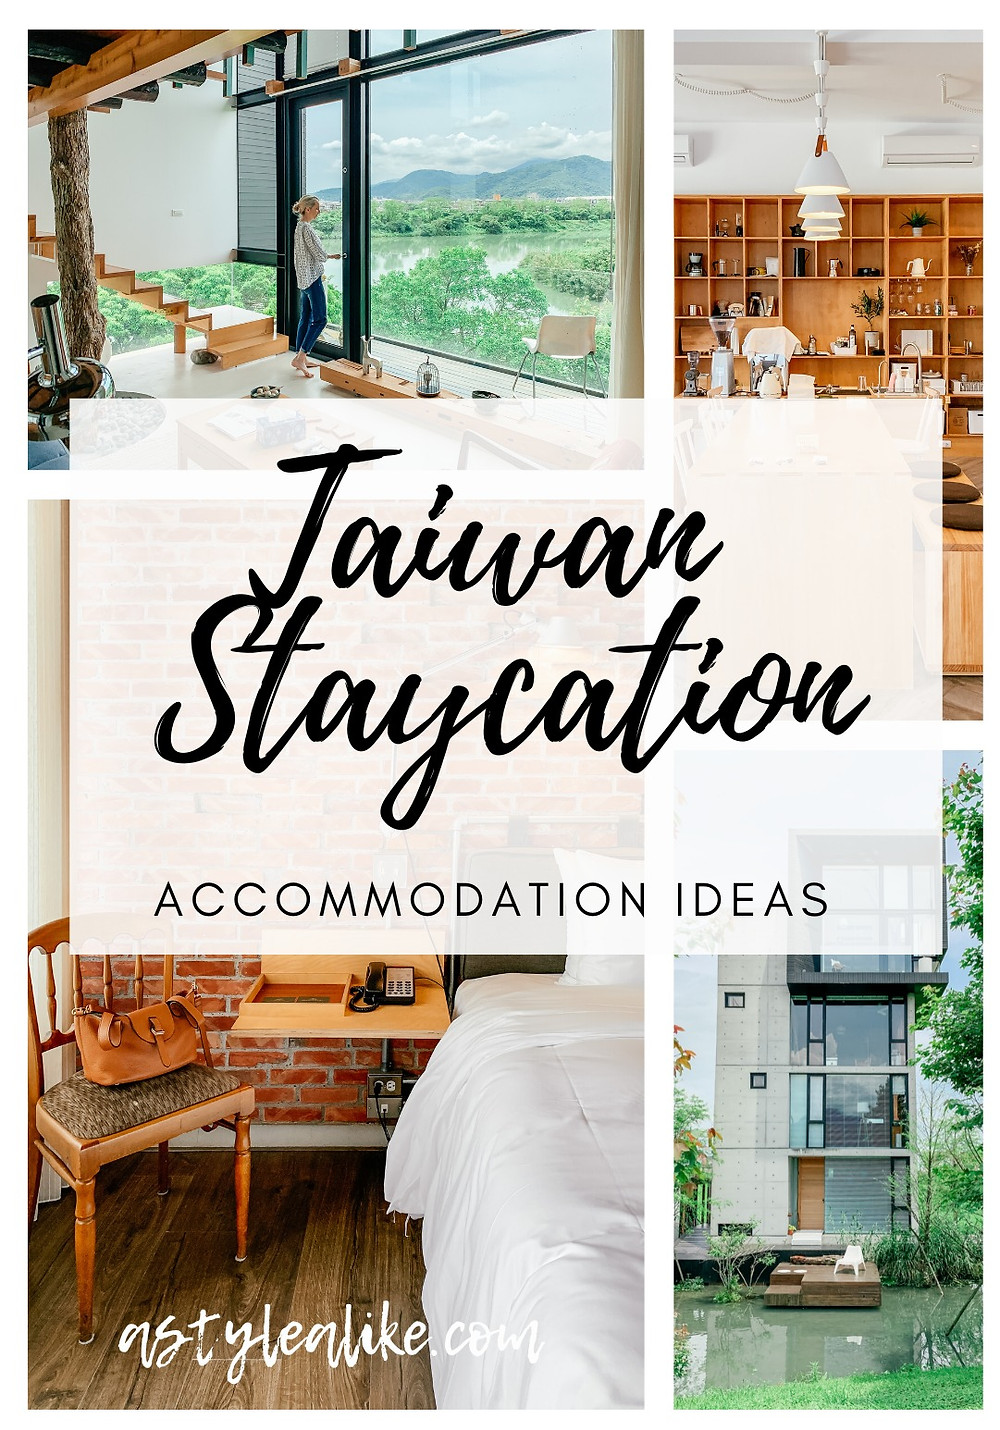 Taiwan Summer Staycation | Accommodation Ideas | Travel | A Style Alike